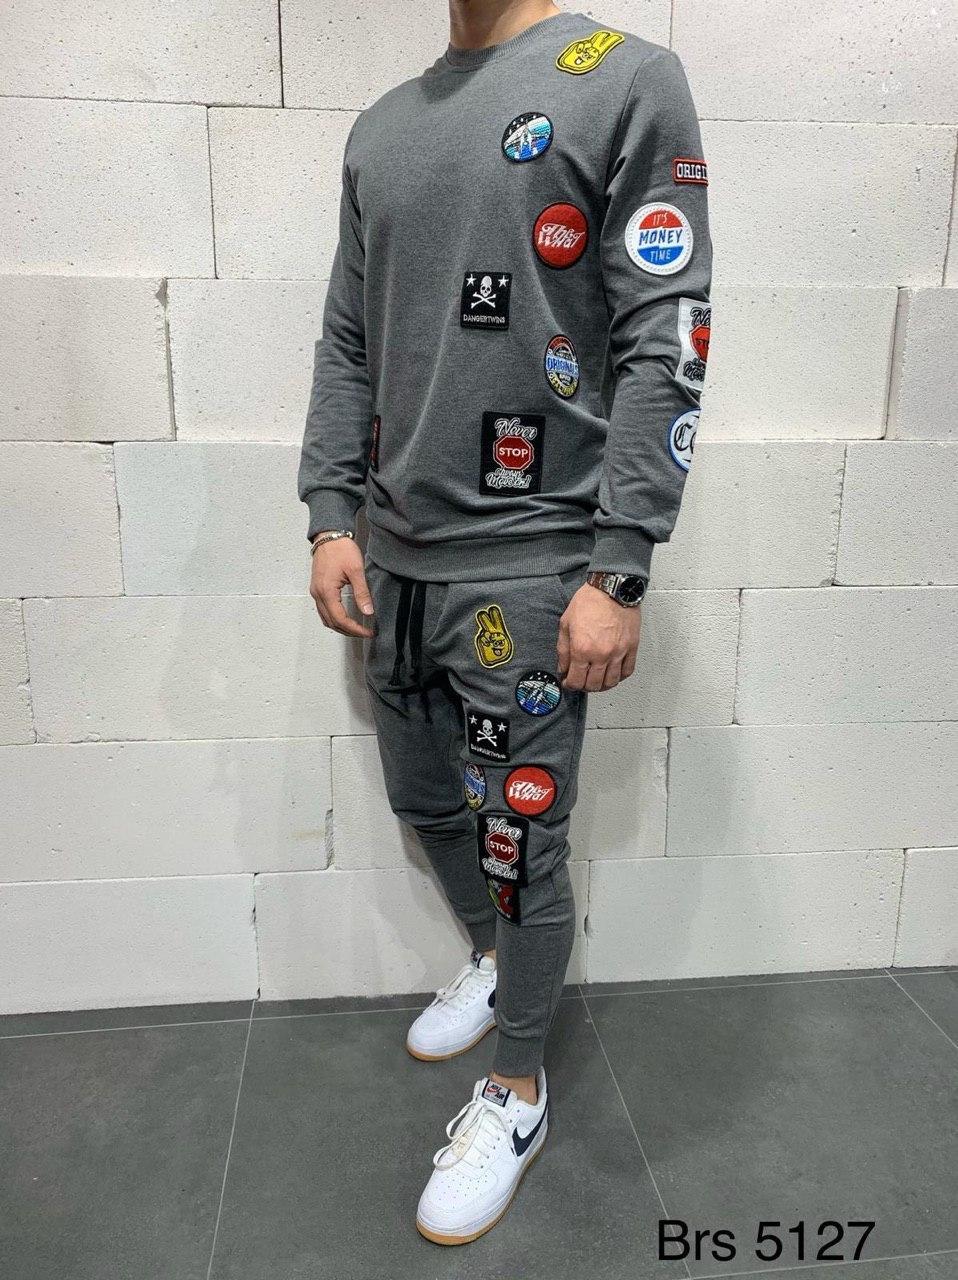 😜 Спортивный костюм - мужской спортивный костюм с нашивками (серый)